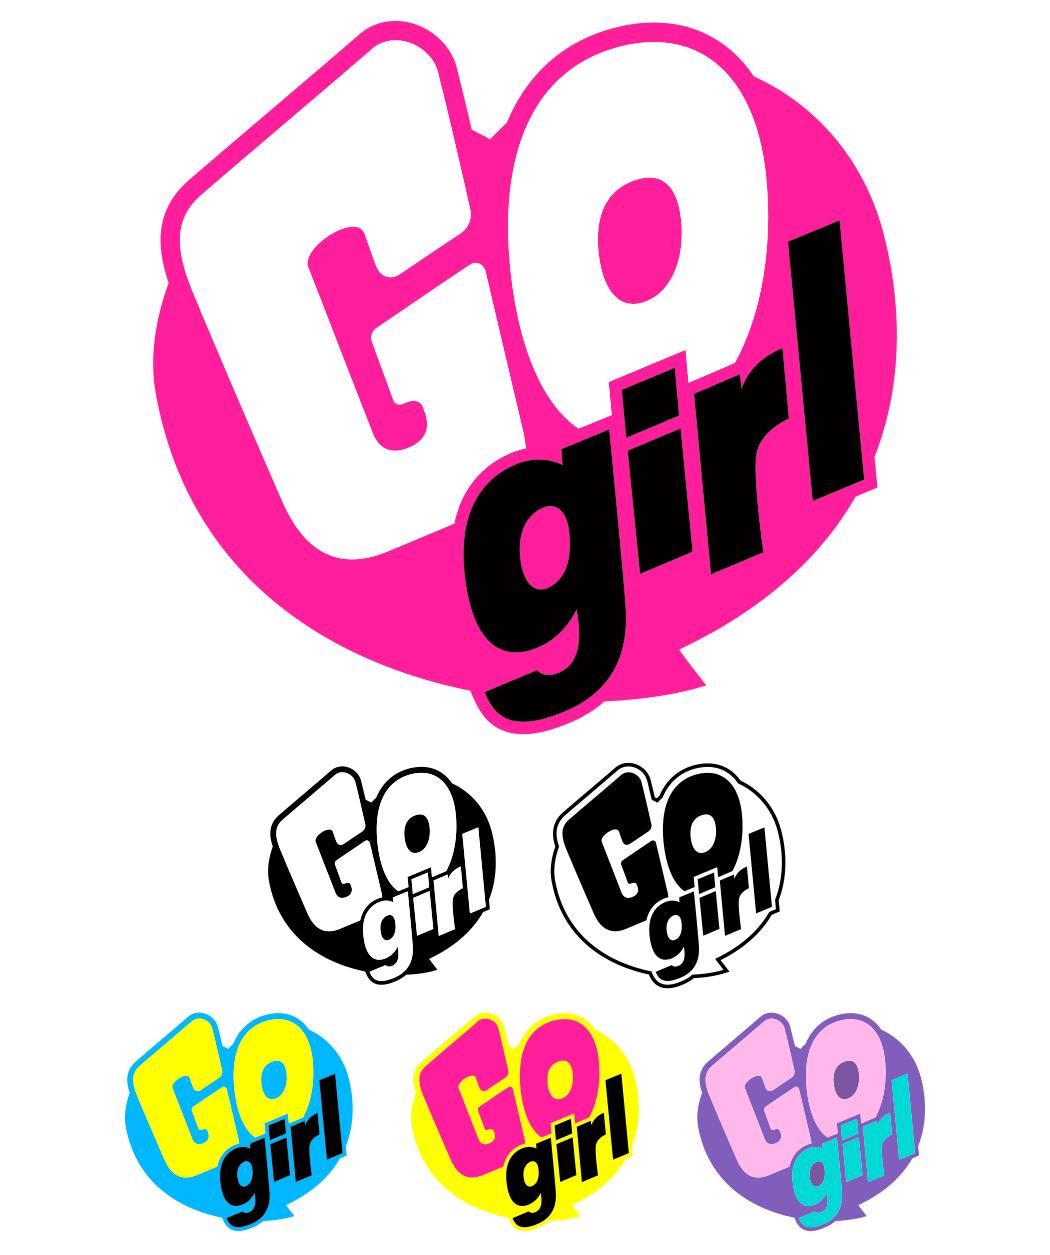 gogirl1